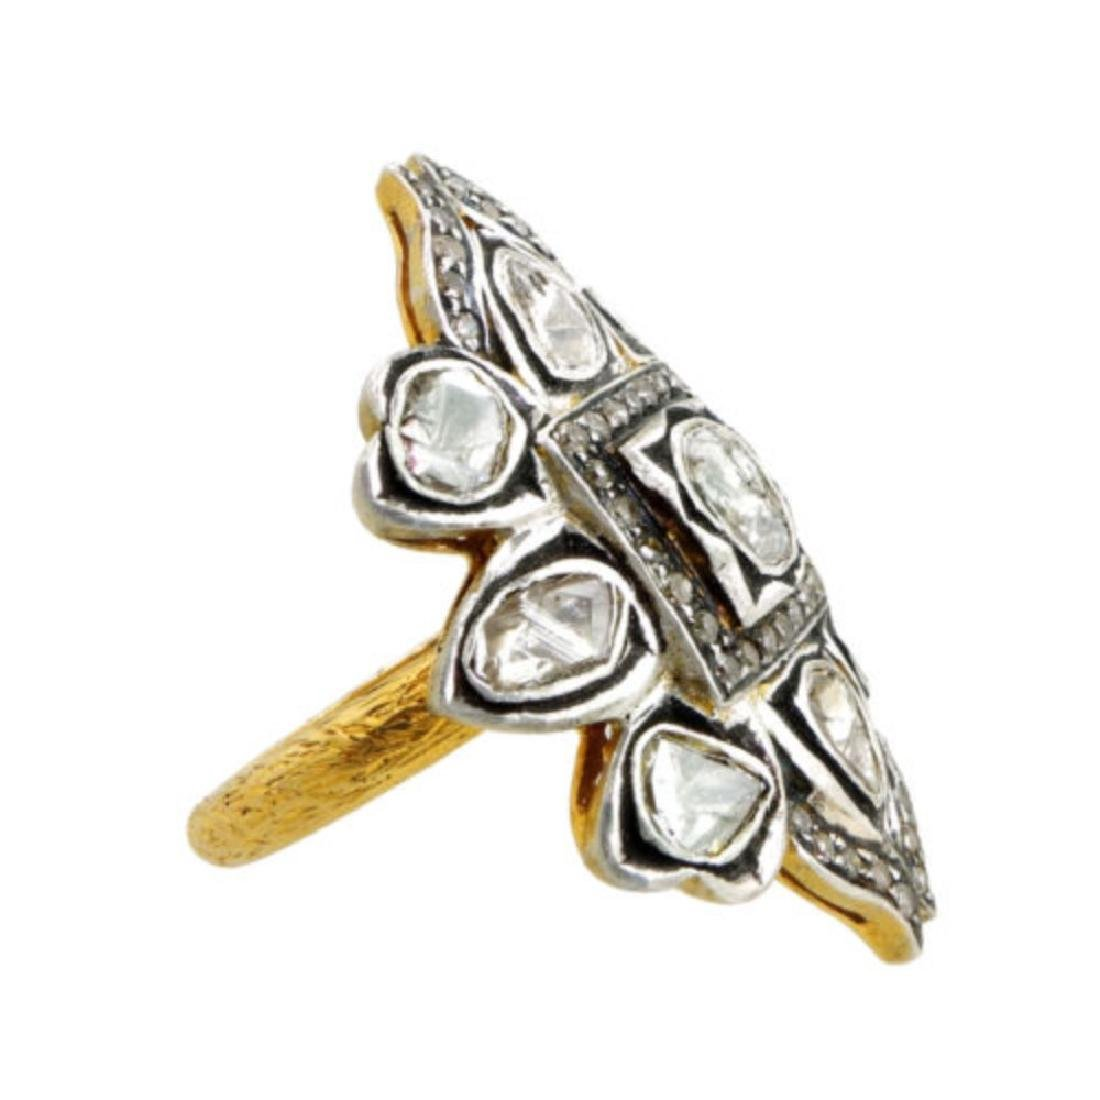 Natural Rose Cut Diamond Pave Ring. 14K Yellow Gold - 2